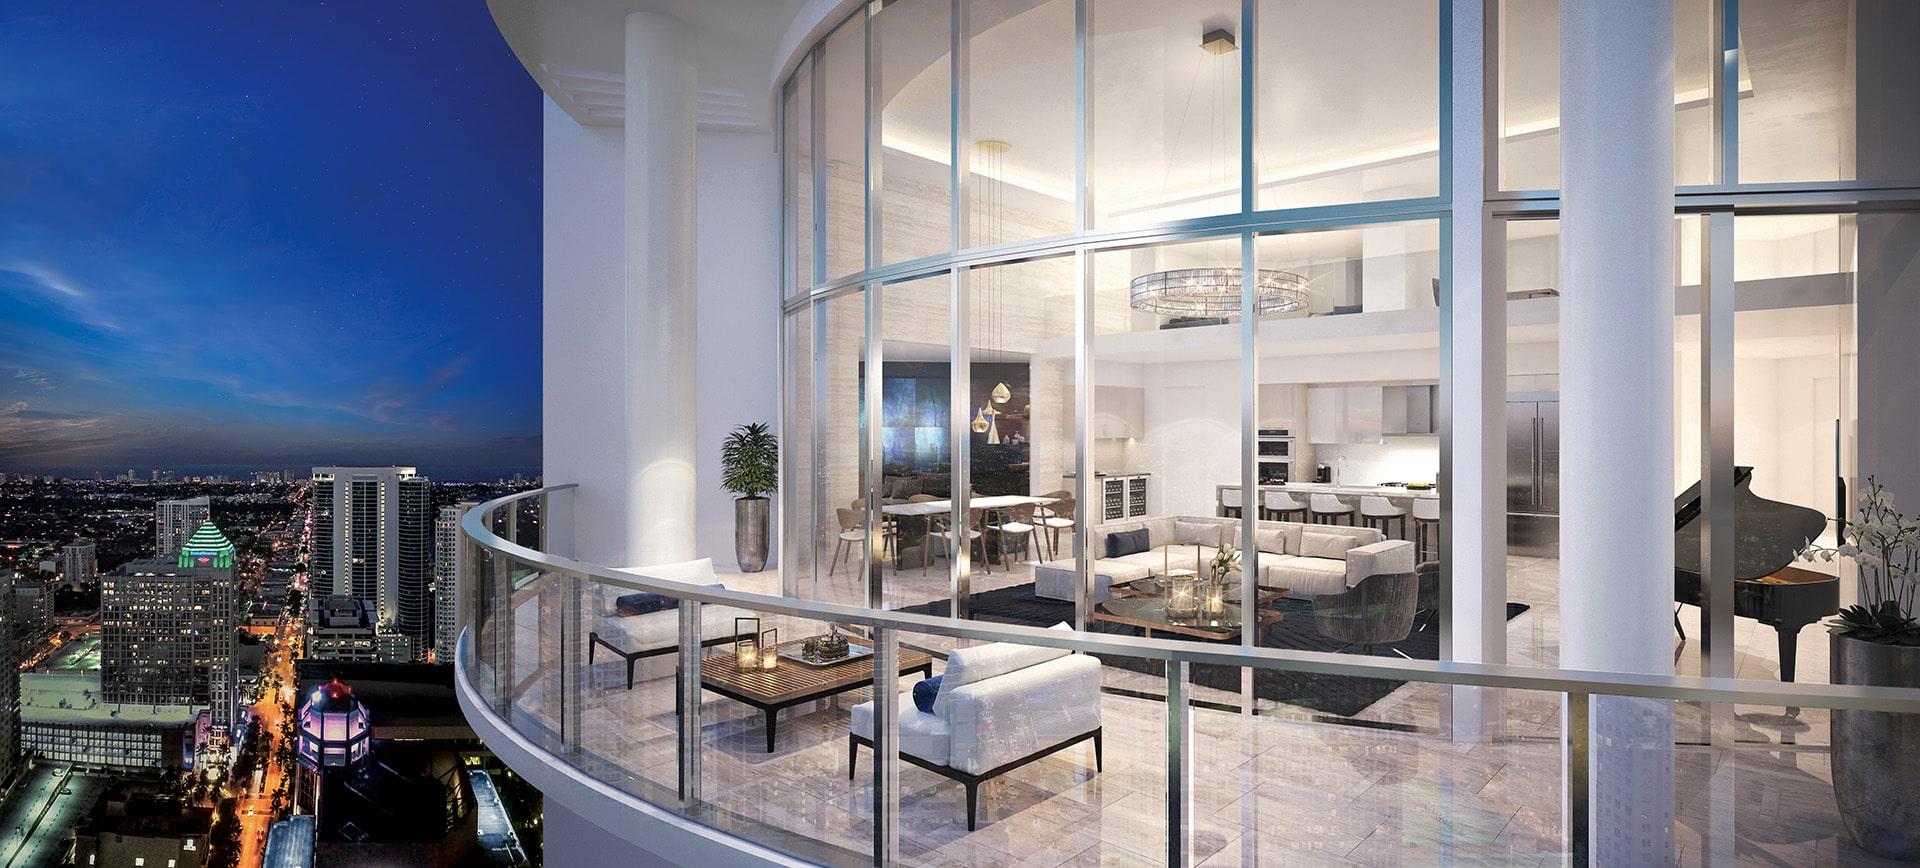 100 Las Olas Penthouse 4603 Balcony Rendering by Kolter Urban